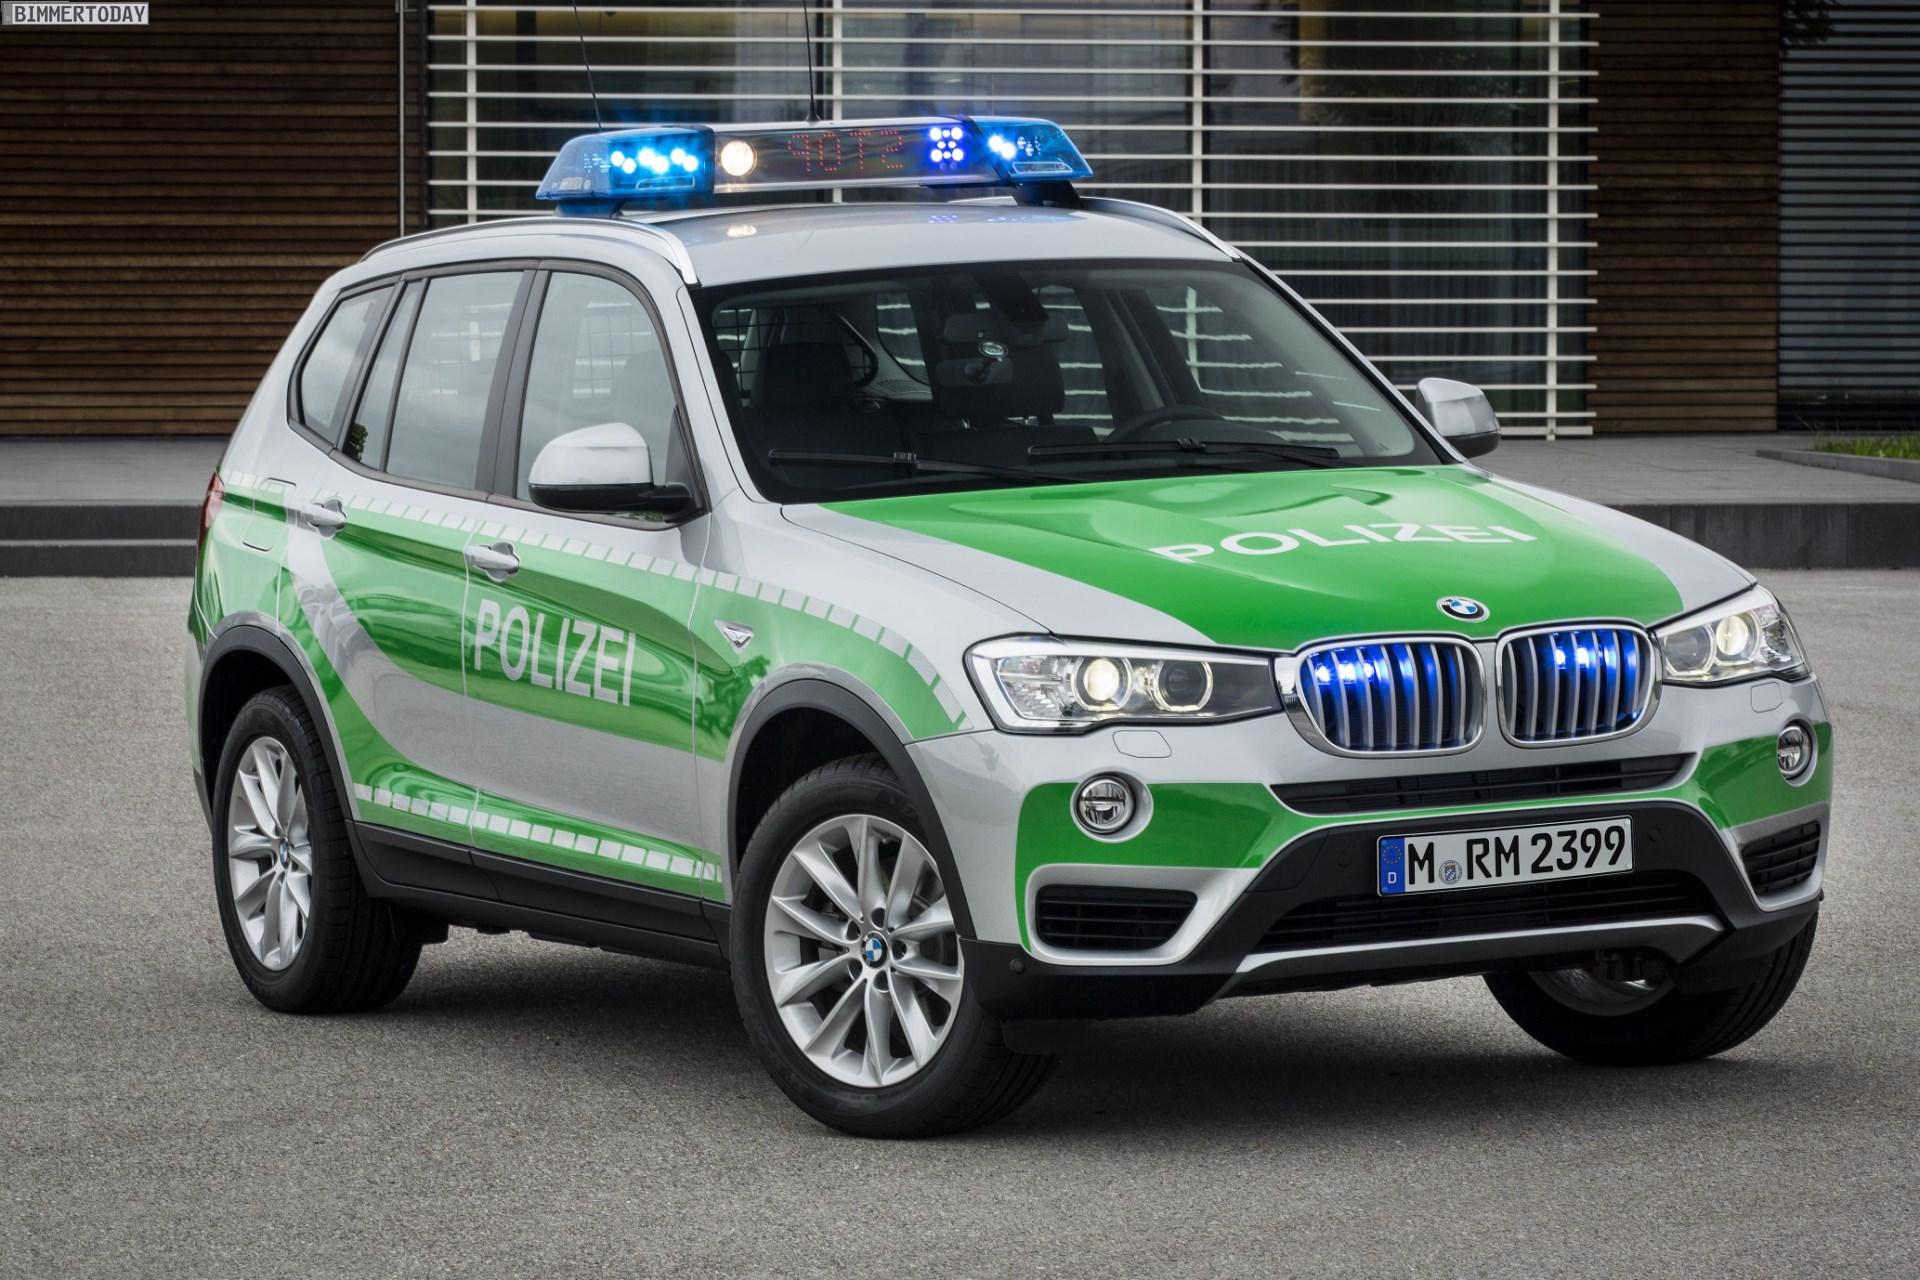 Dubai Police Car Wallpapers Gpec 2014 Bmw X3 F25 Lci Als Polizei Auto Vorgestellt